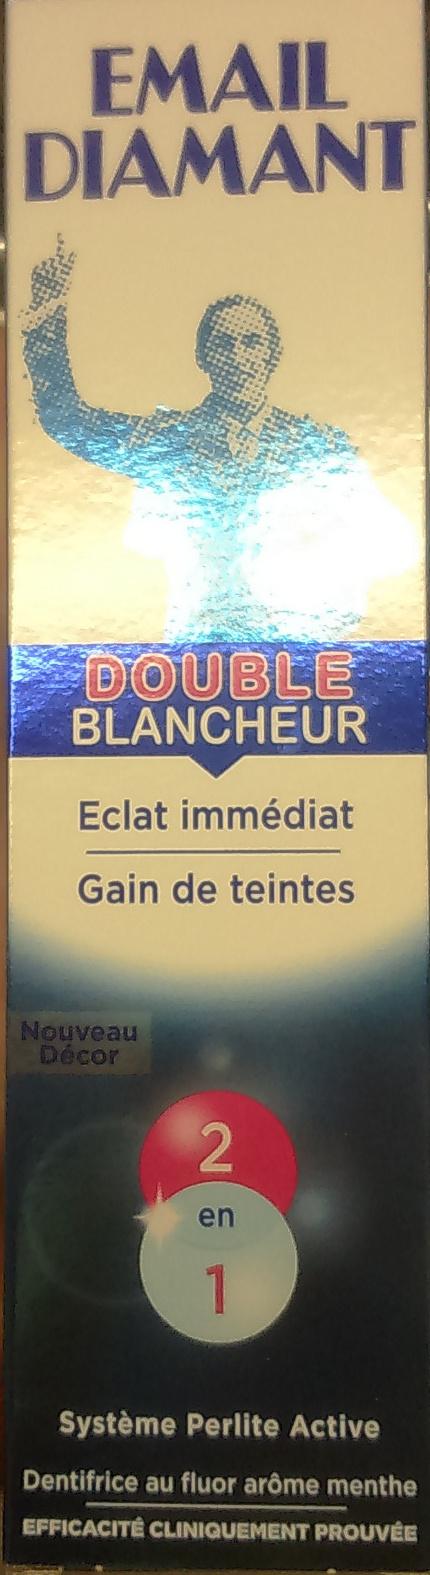 Dentifrice au fluor arôme menthe - Produit